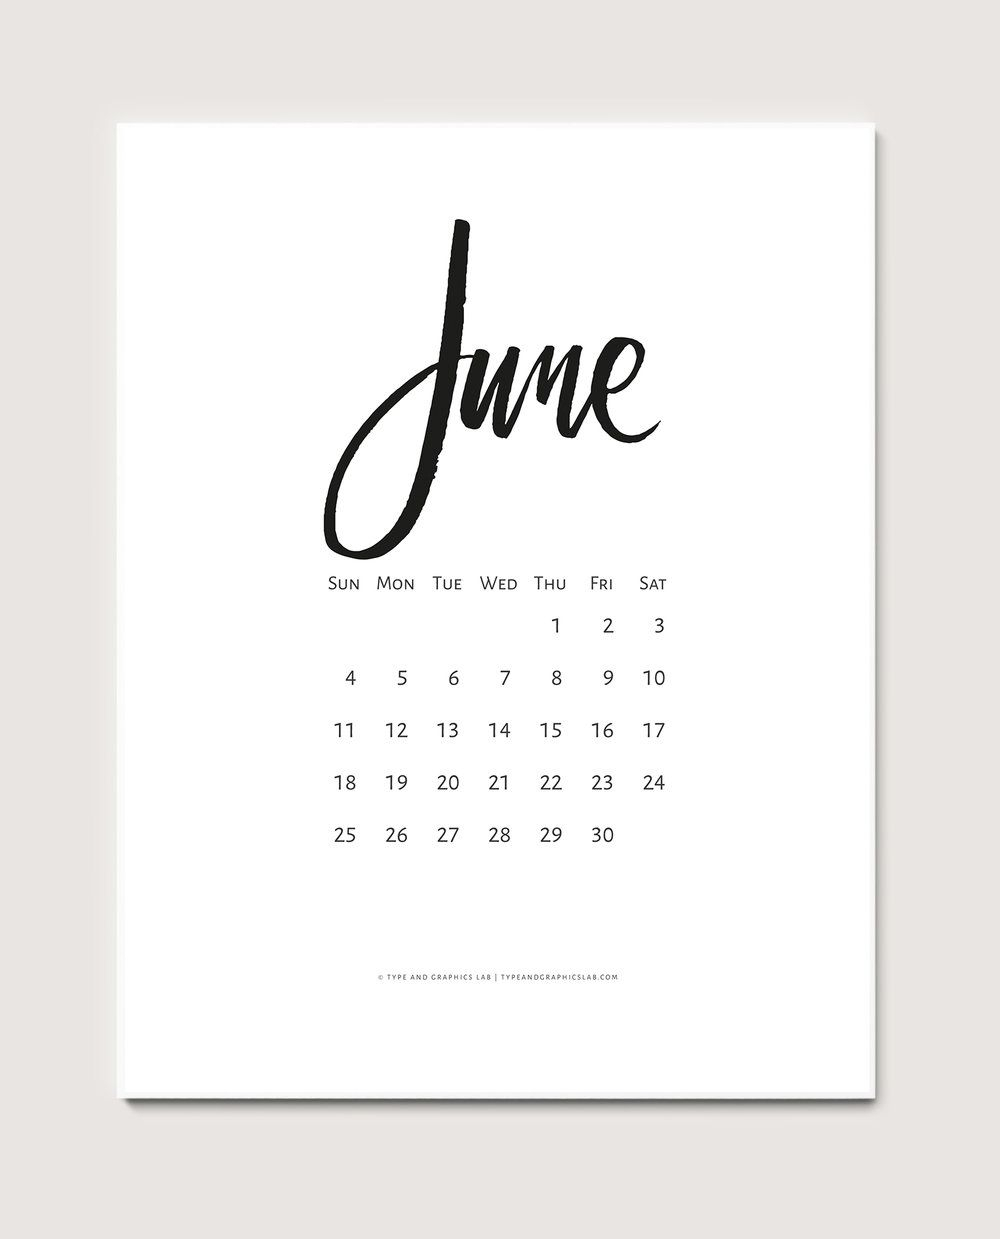 Free Calendar: June 2017 (With Images)   Free Calendar